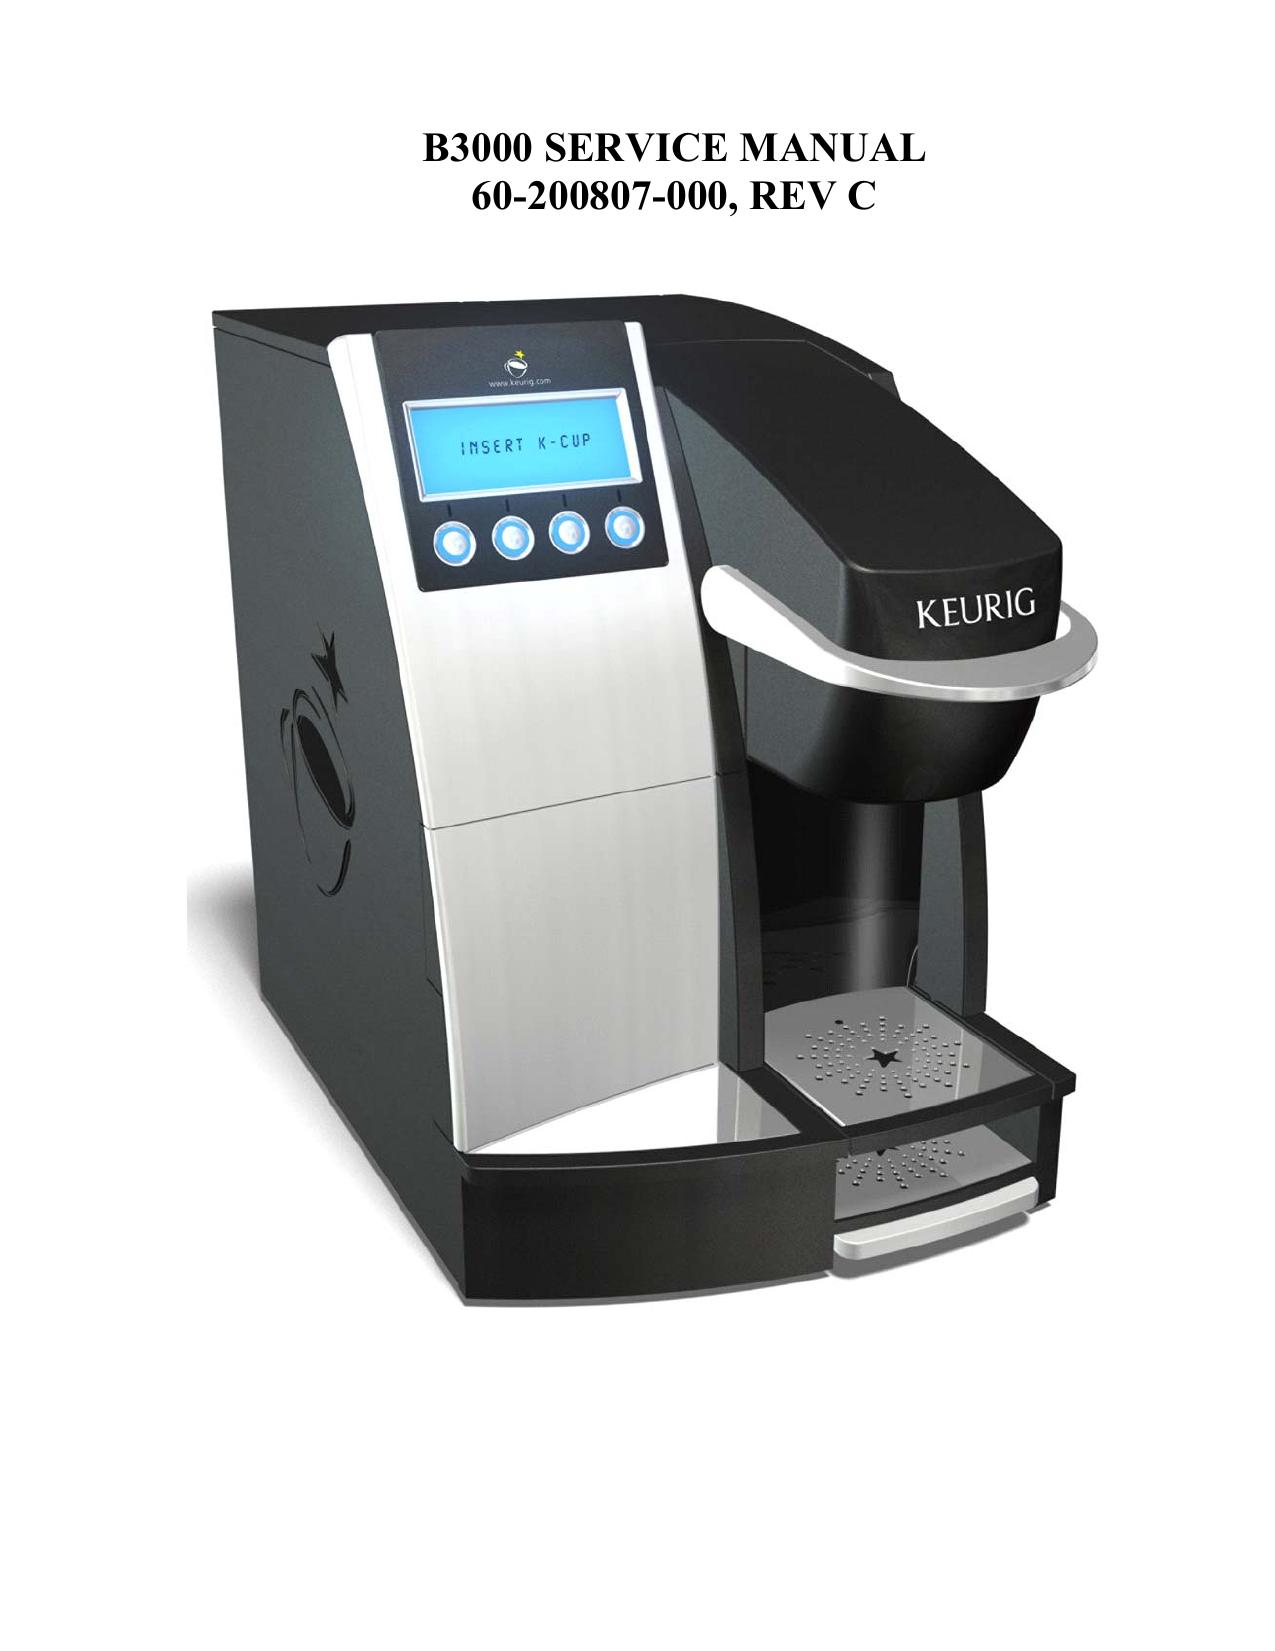 keurig b3000 coffeemaker user manual manualzz com rh manualzz com Keurig B3000SE Manual Keurig B3000SE Manual